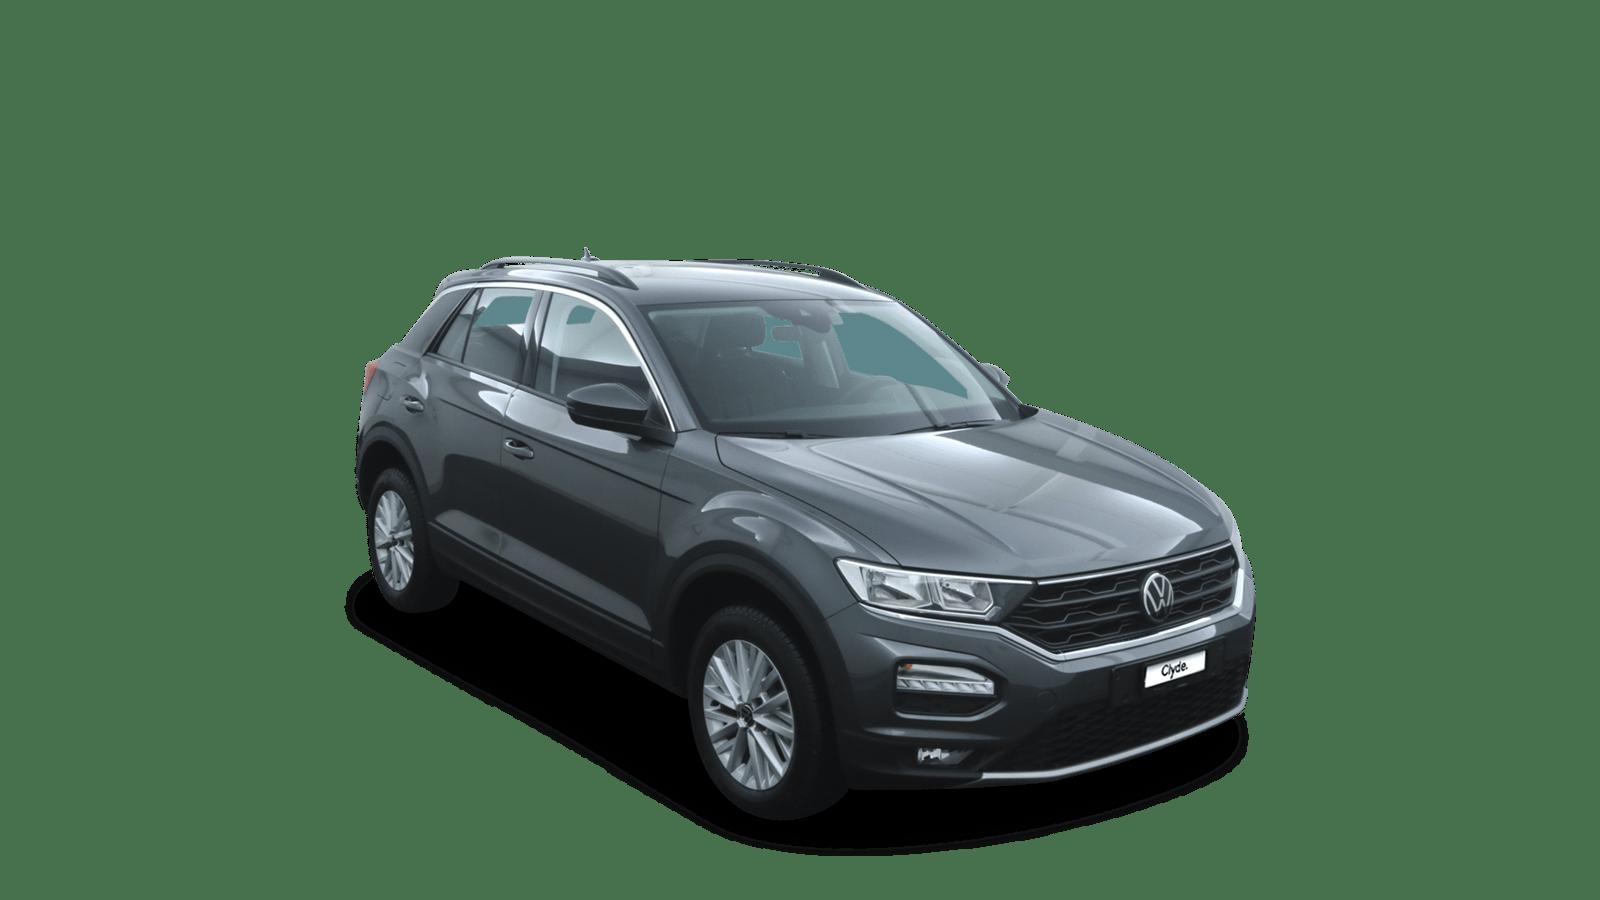 VW T-Roc Grey front - Clyde car subscription